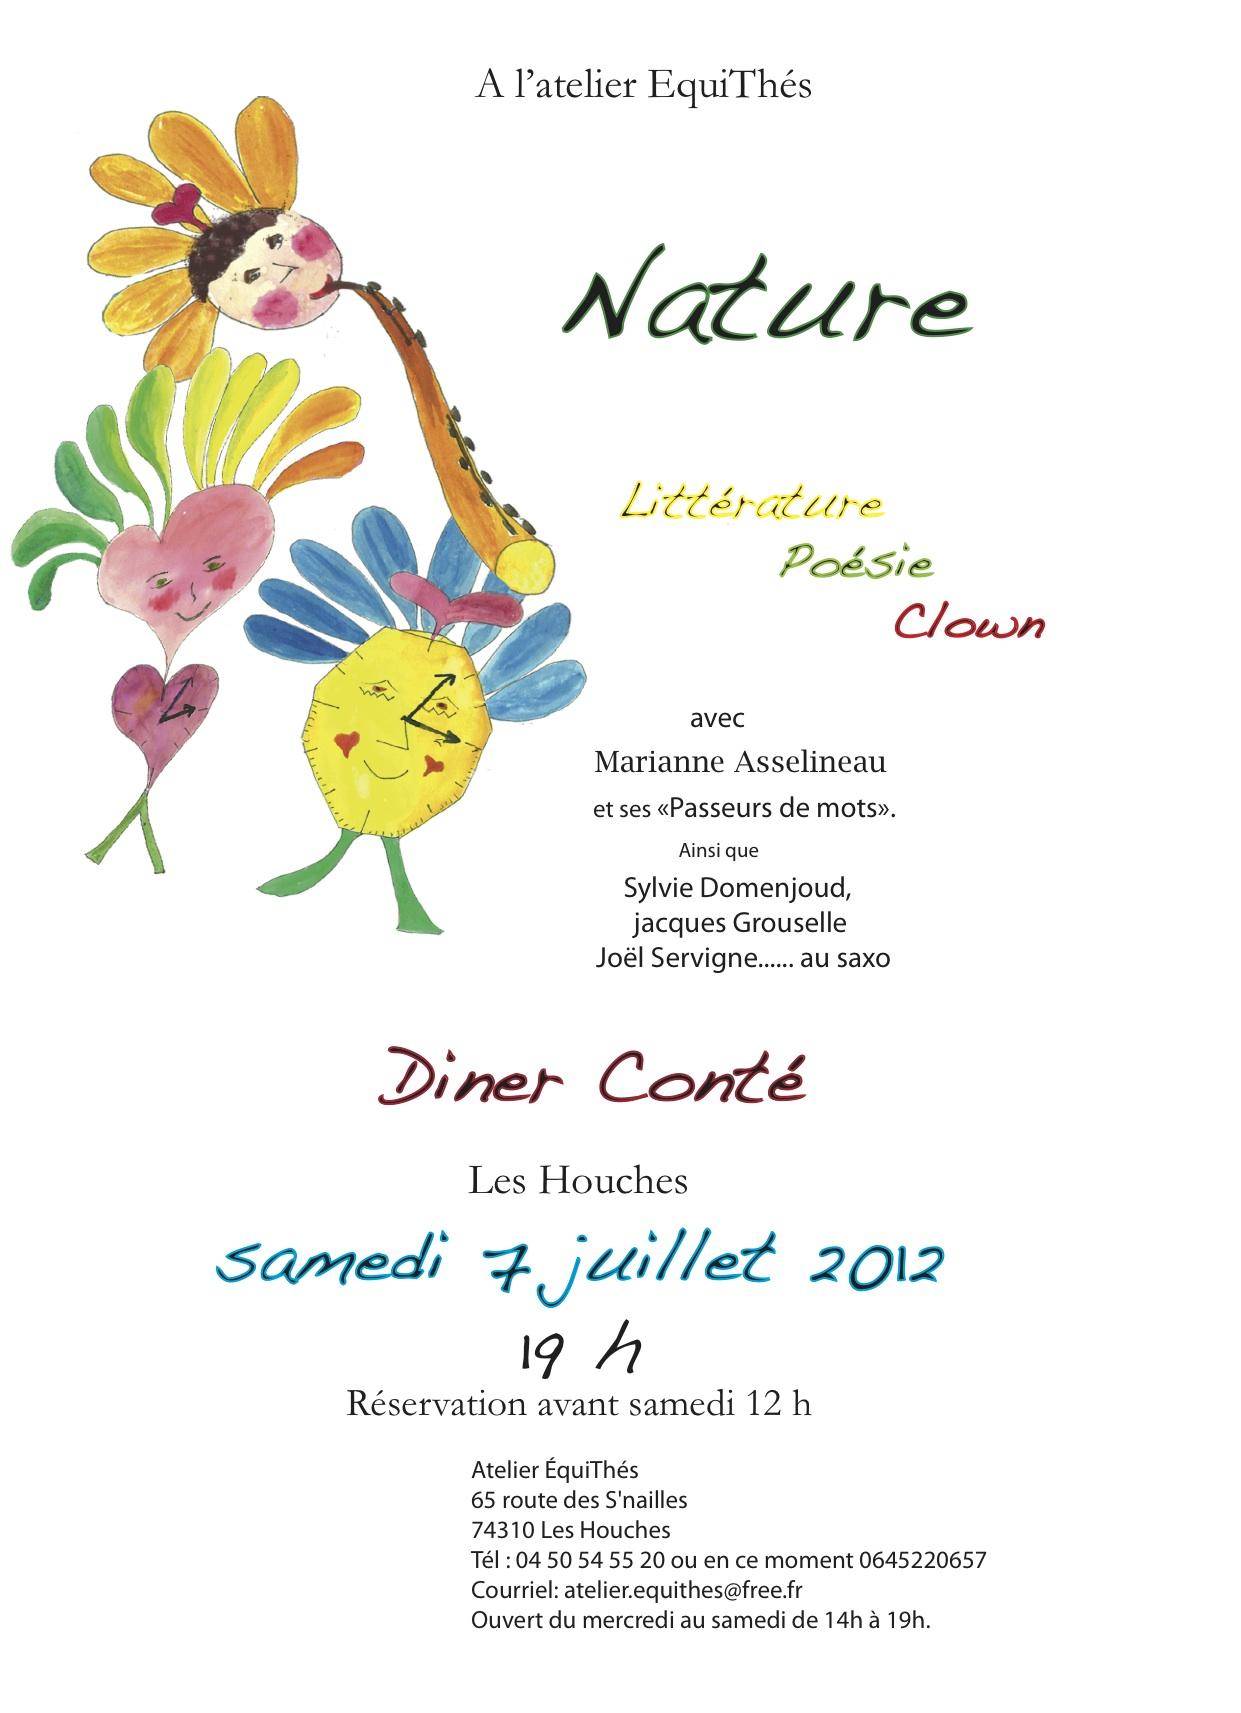 _Nature_Atelier_Equithes_aux_Houches_le_7_06_.jpg